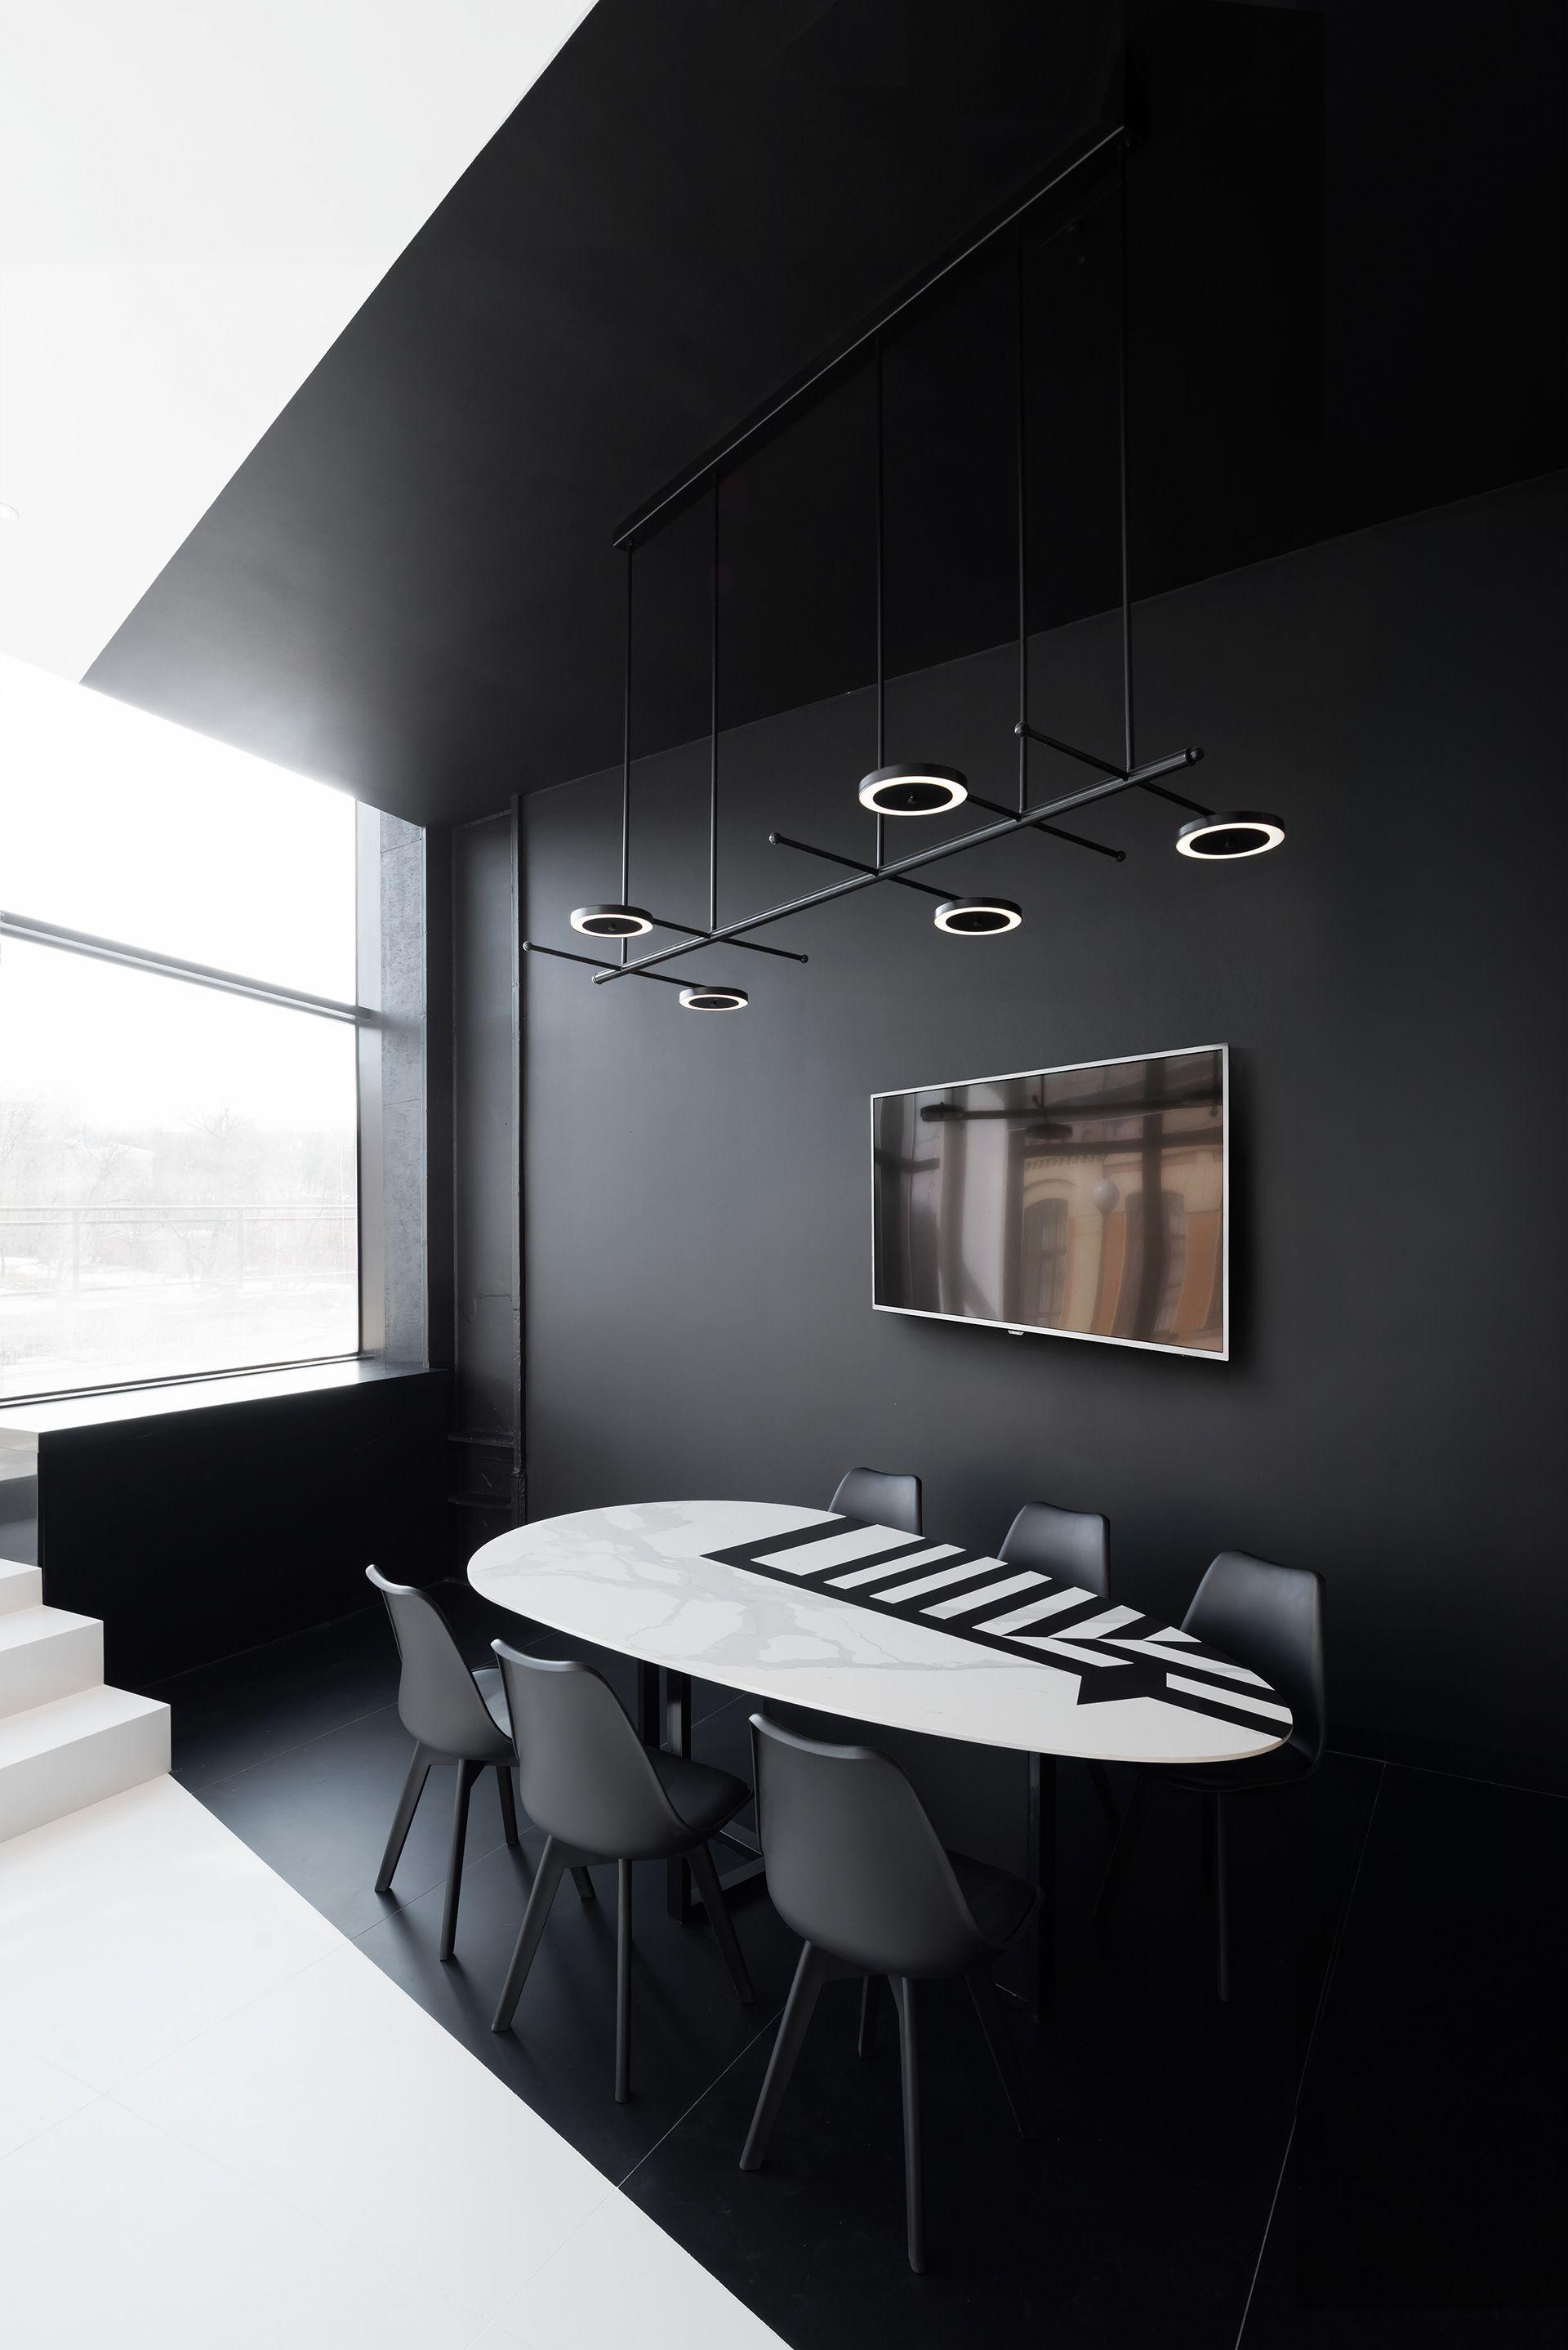 Interior Design Black And White Minimalist Interior Showroom Ceramic Frame Interior Showroom Interior Design Office Interior Design Black Interior Design